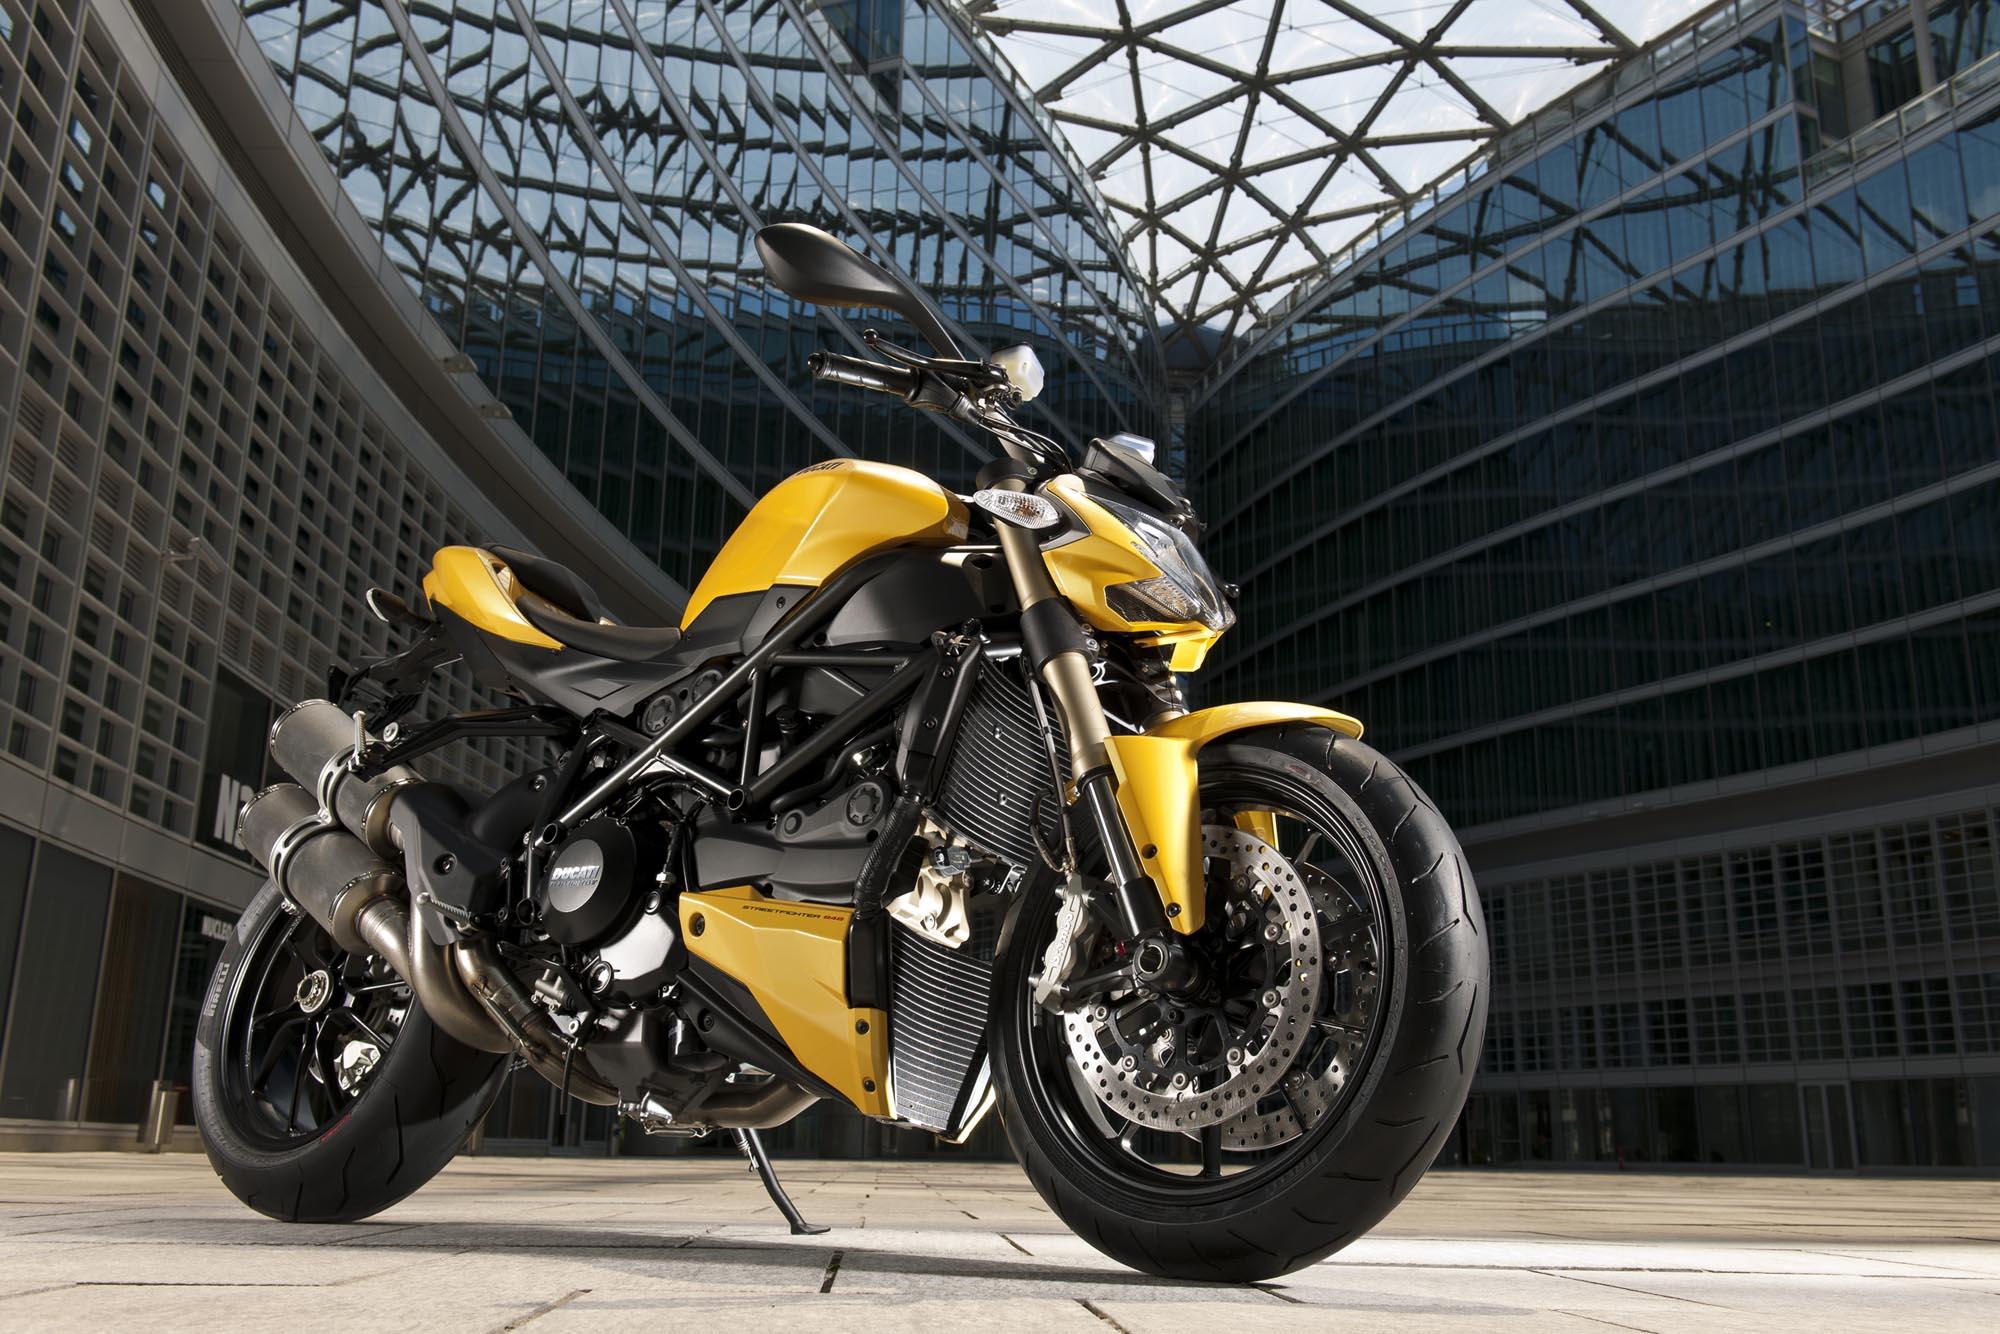 Ducati Streetfighter 848 Mega Gallery